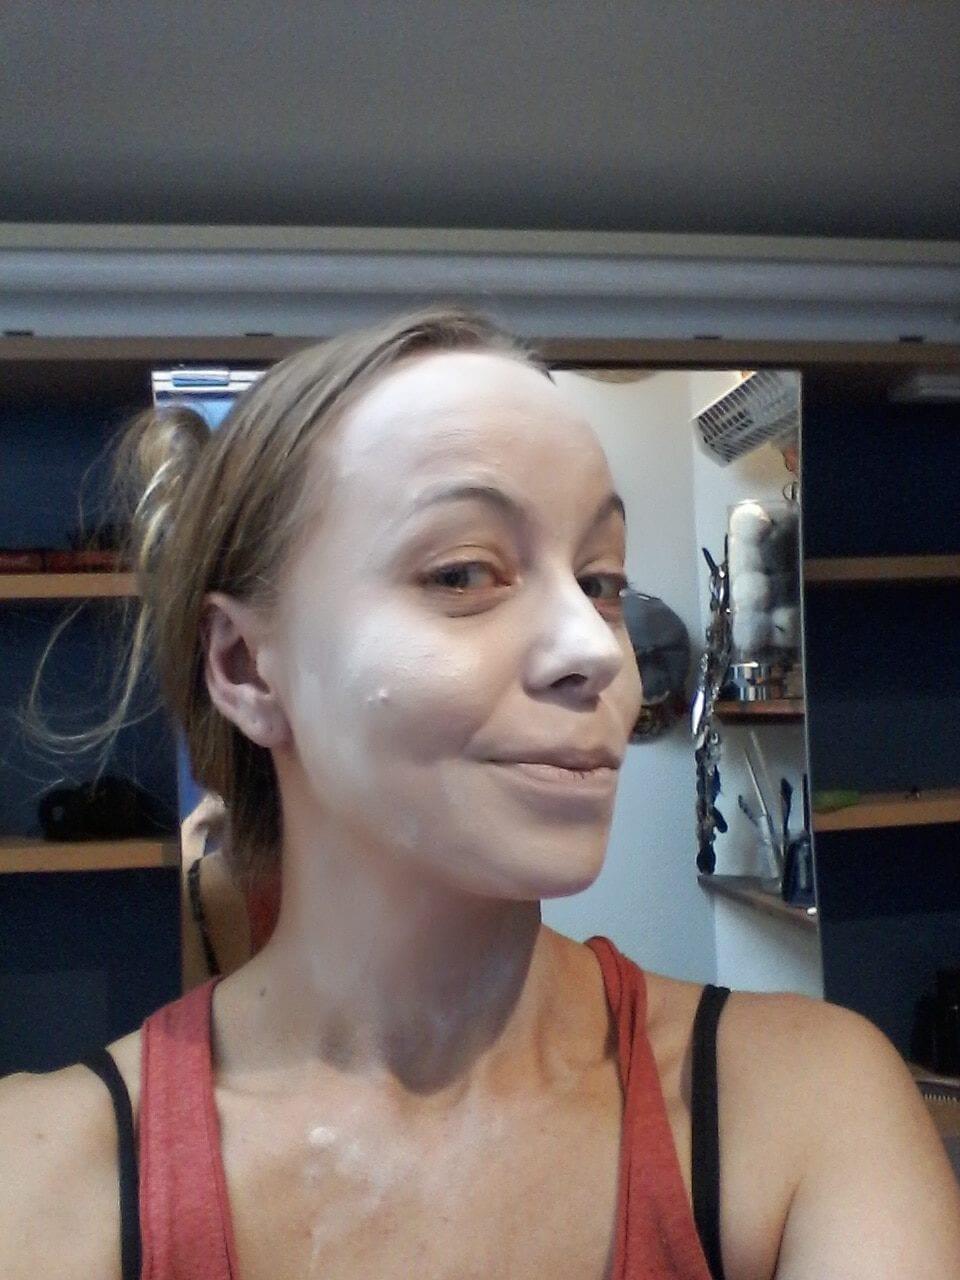 Maquillage halloween - l'exorciste - visage peint en blanc